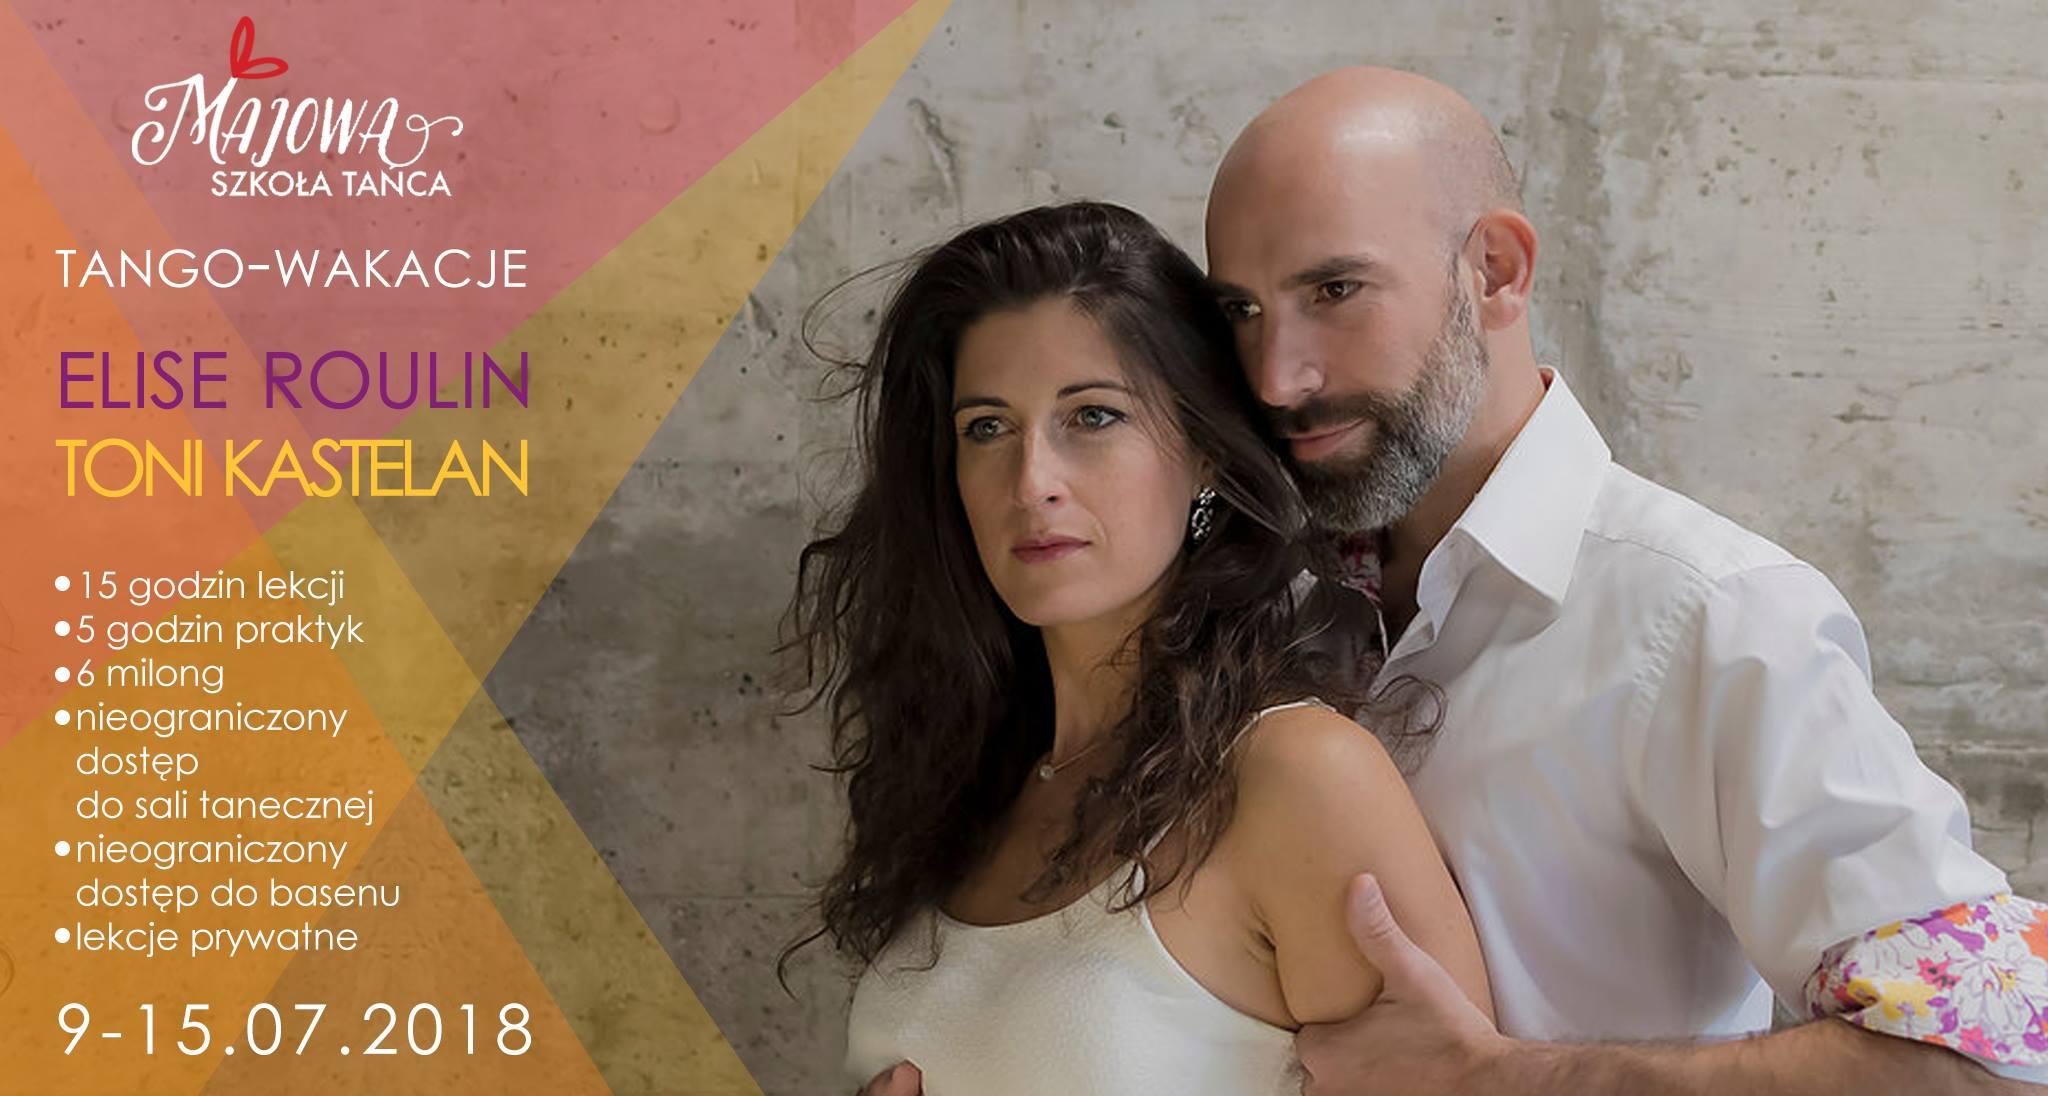 Tango wakacje z Elise Roulin & Toni Kastelan